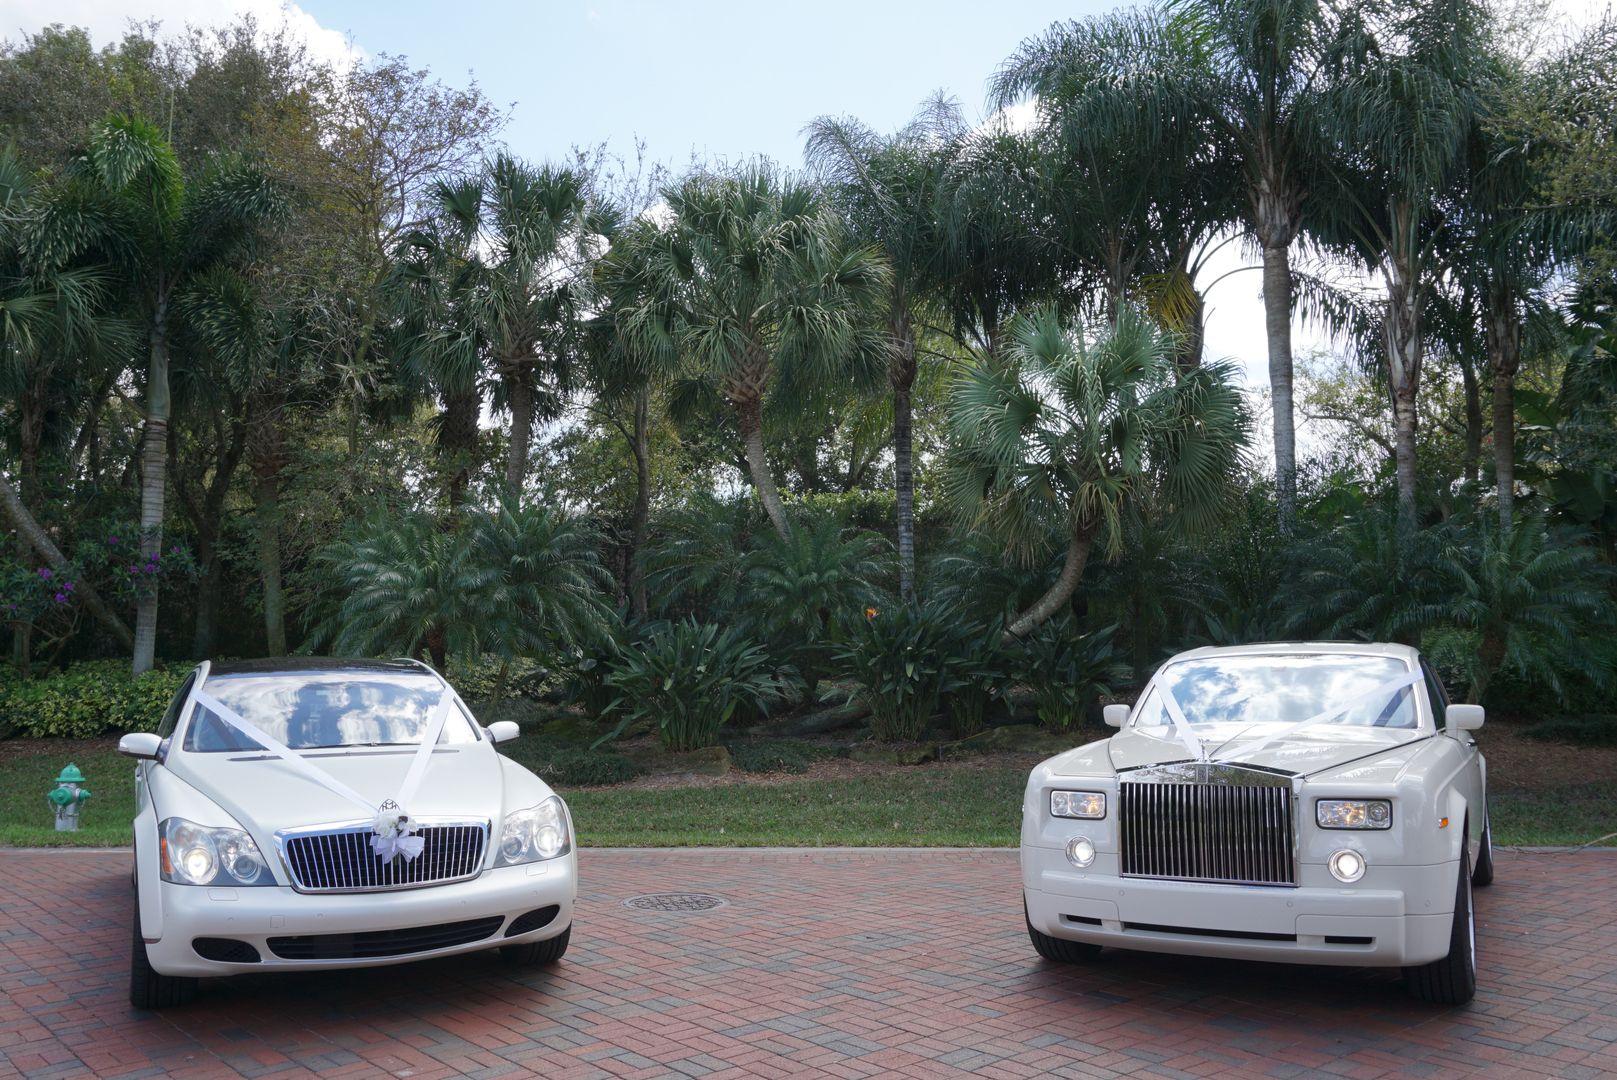 Orlando Rolls Royce Wedding Car And Limousine Rental Dream Cars Limousine Rental Car